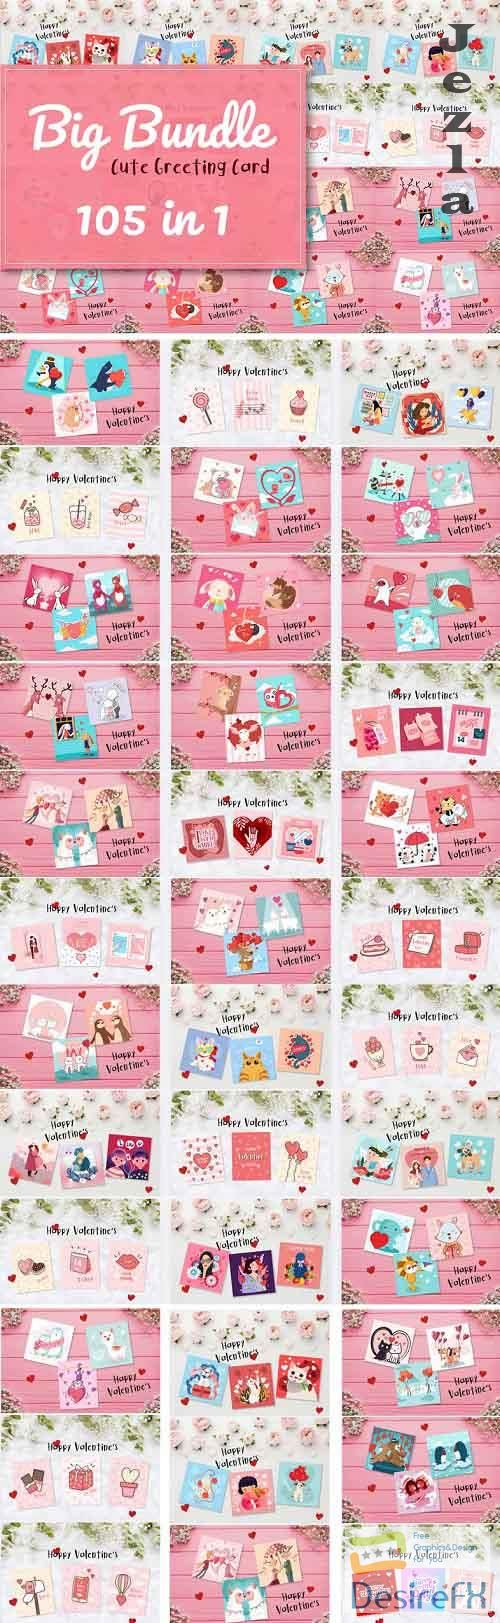 The Cute Greeting Card Bundle - 35 Premium Graphics